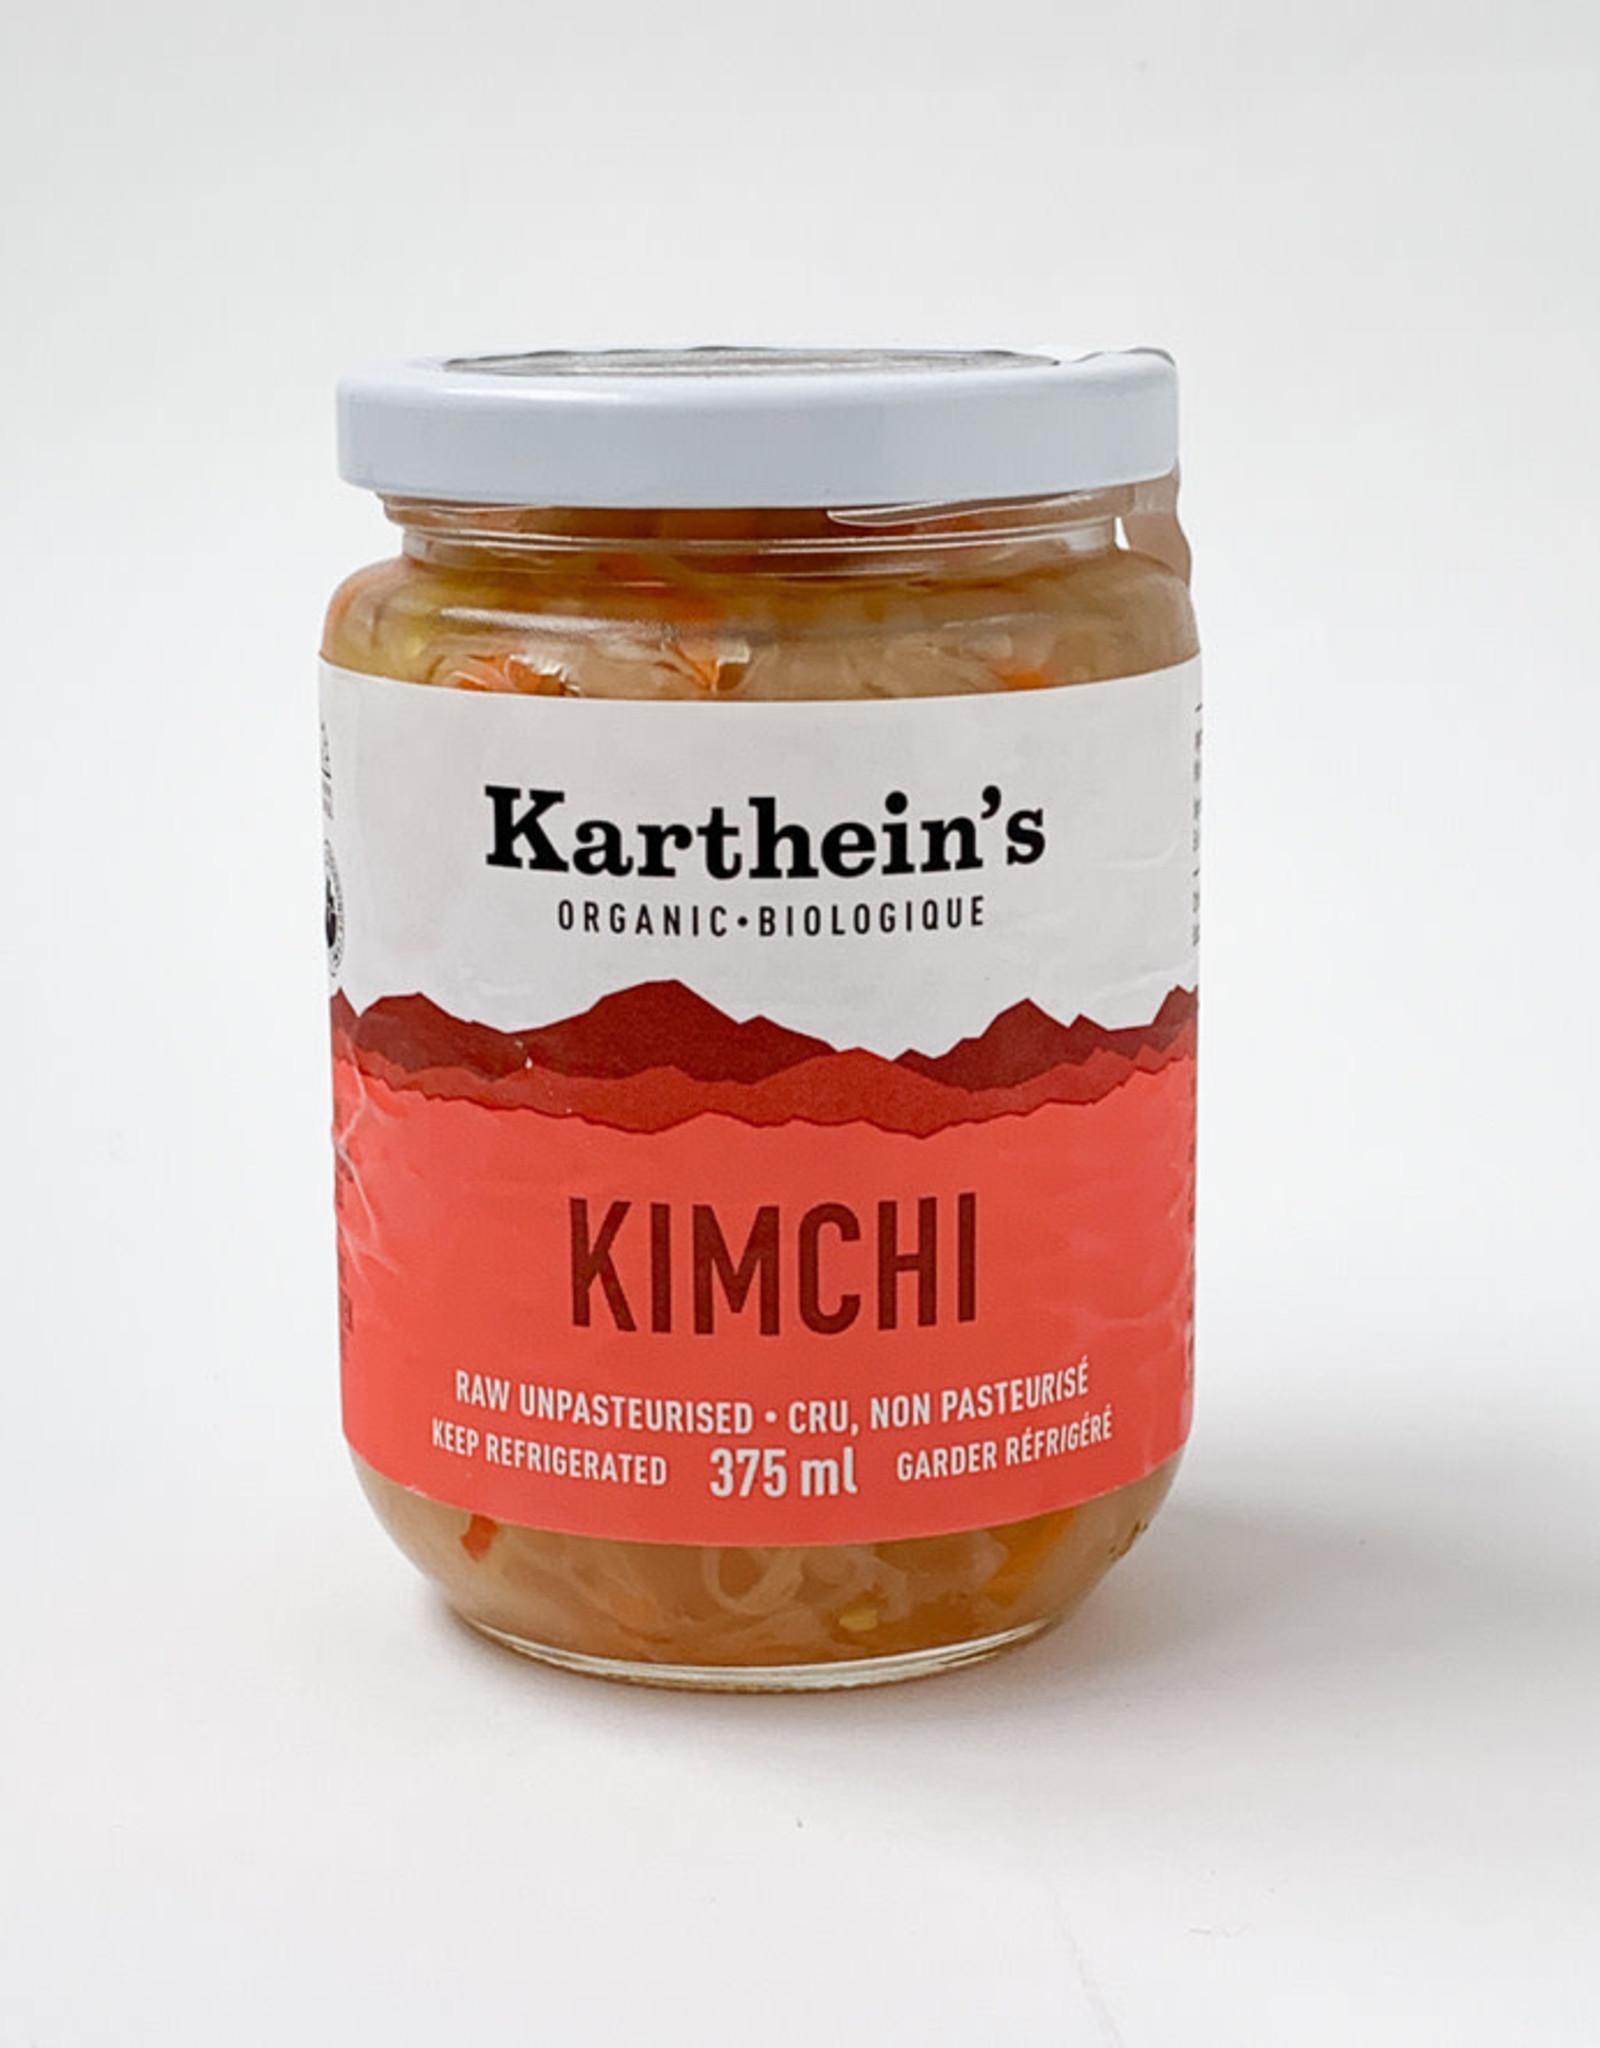 Karthein's Kartheins - Organic Kimchi, 375ml